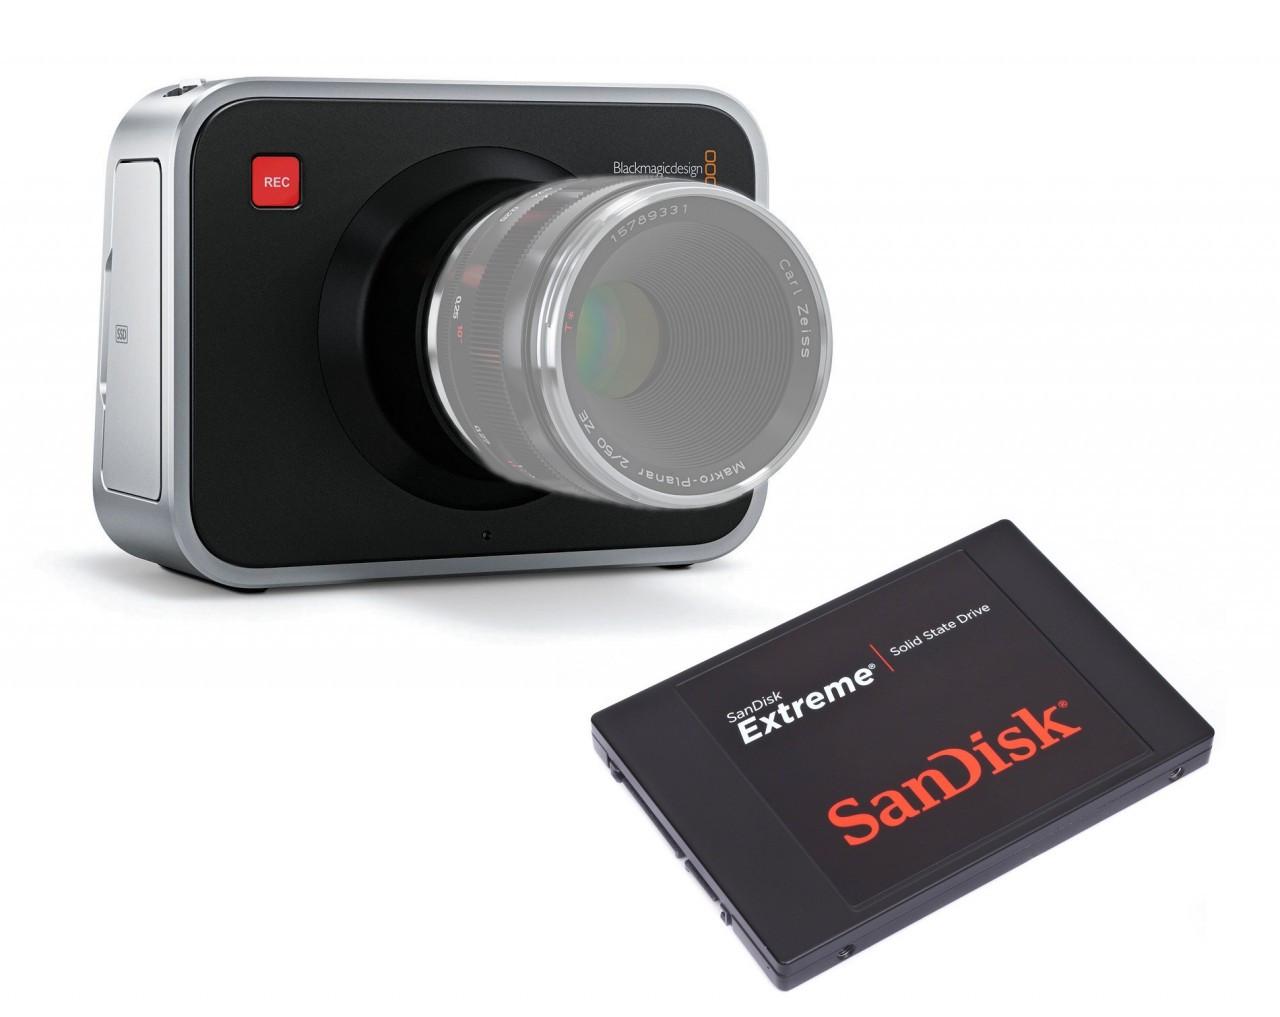 Blackmagic Cinema Camera EF Mount with SanDisk Extreme 240G SSD Video